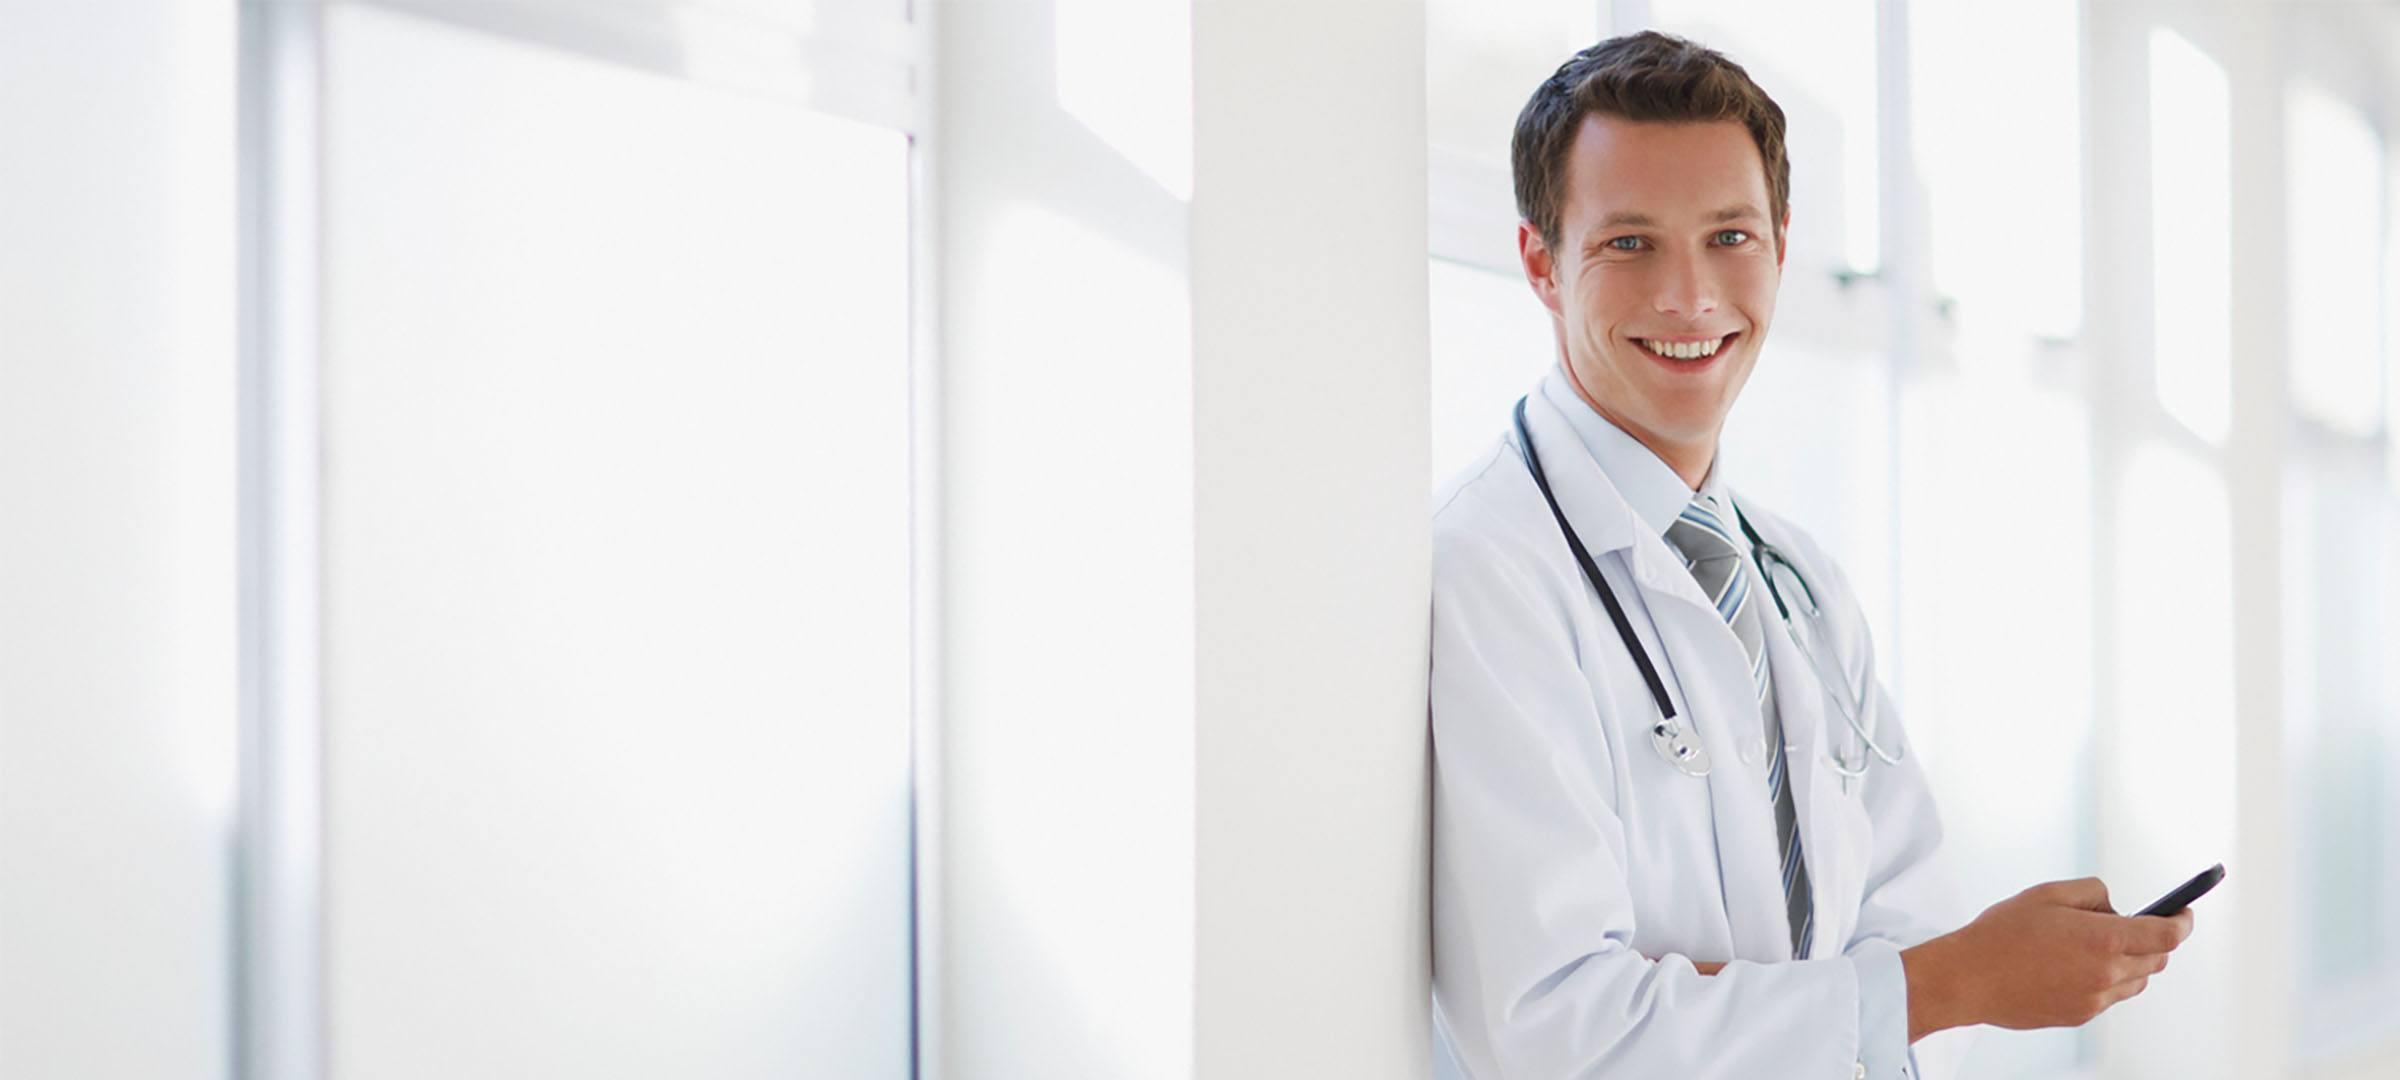 Arzt gründet Einzelpraxis.